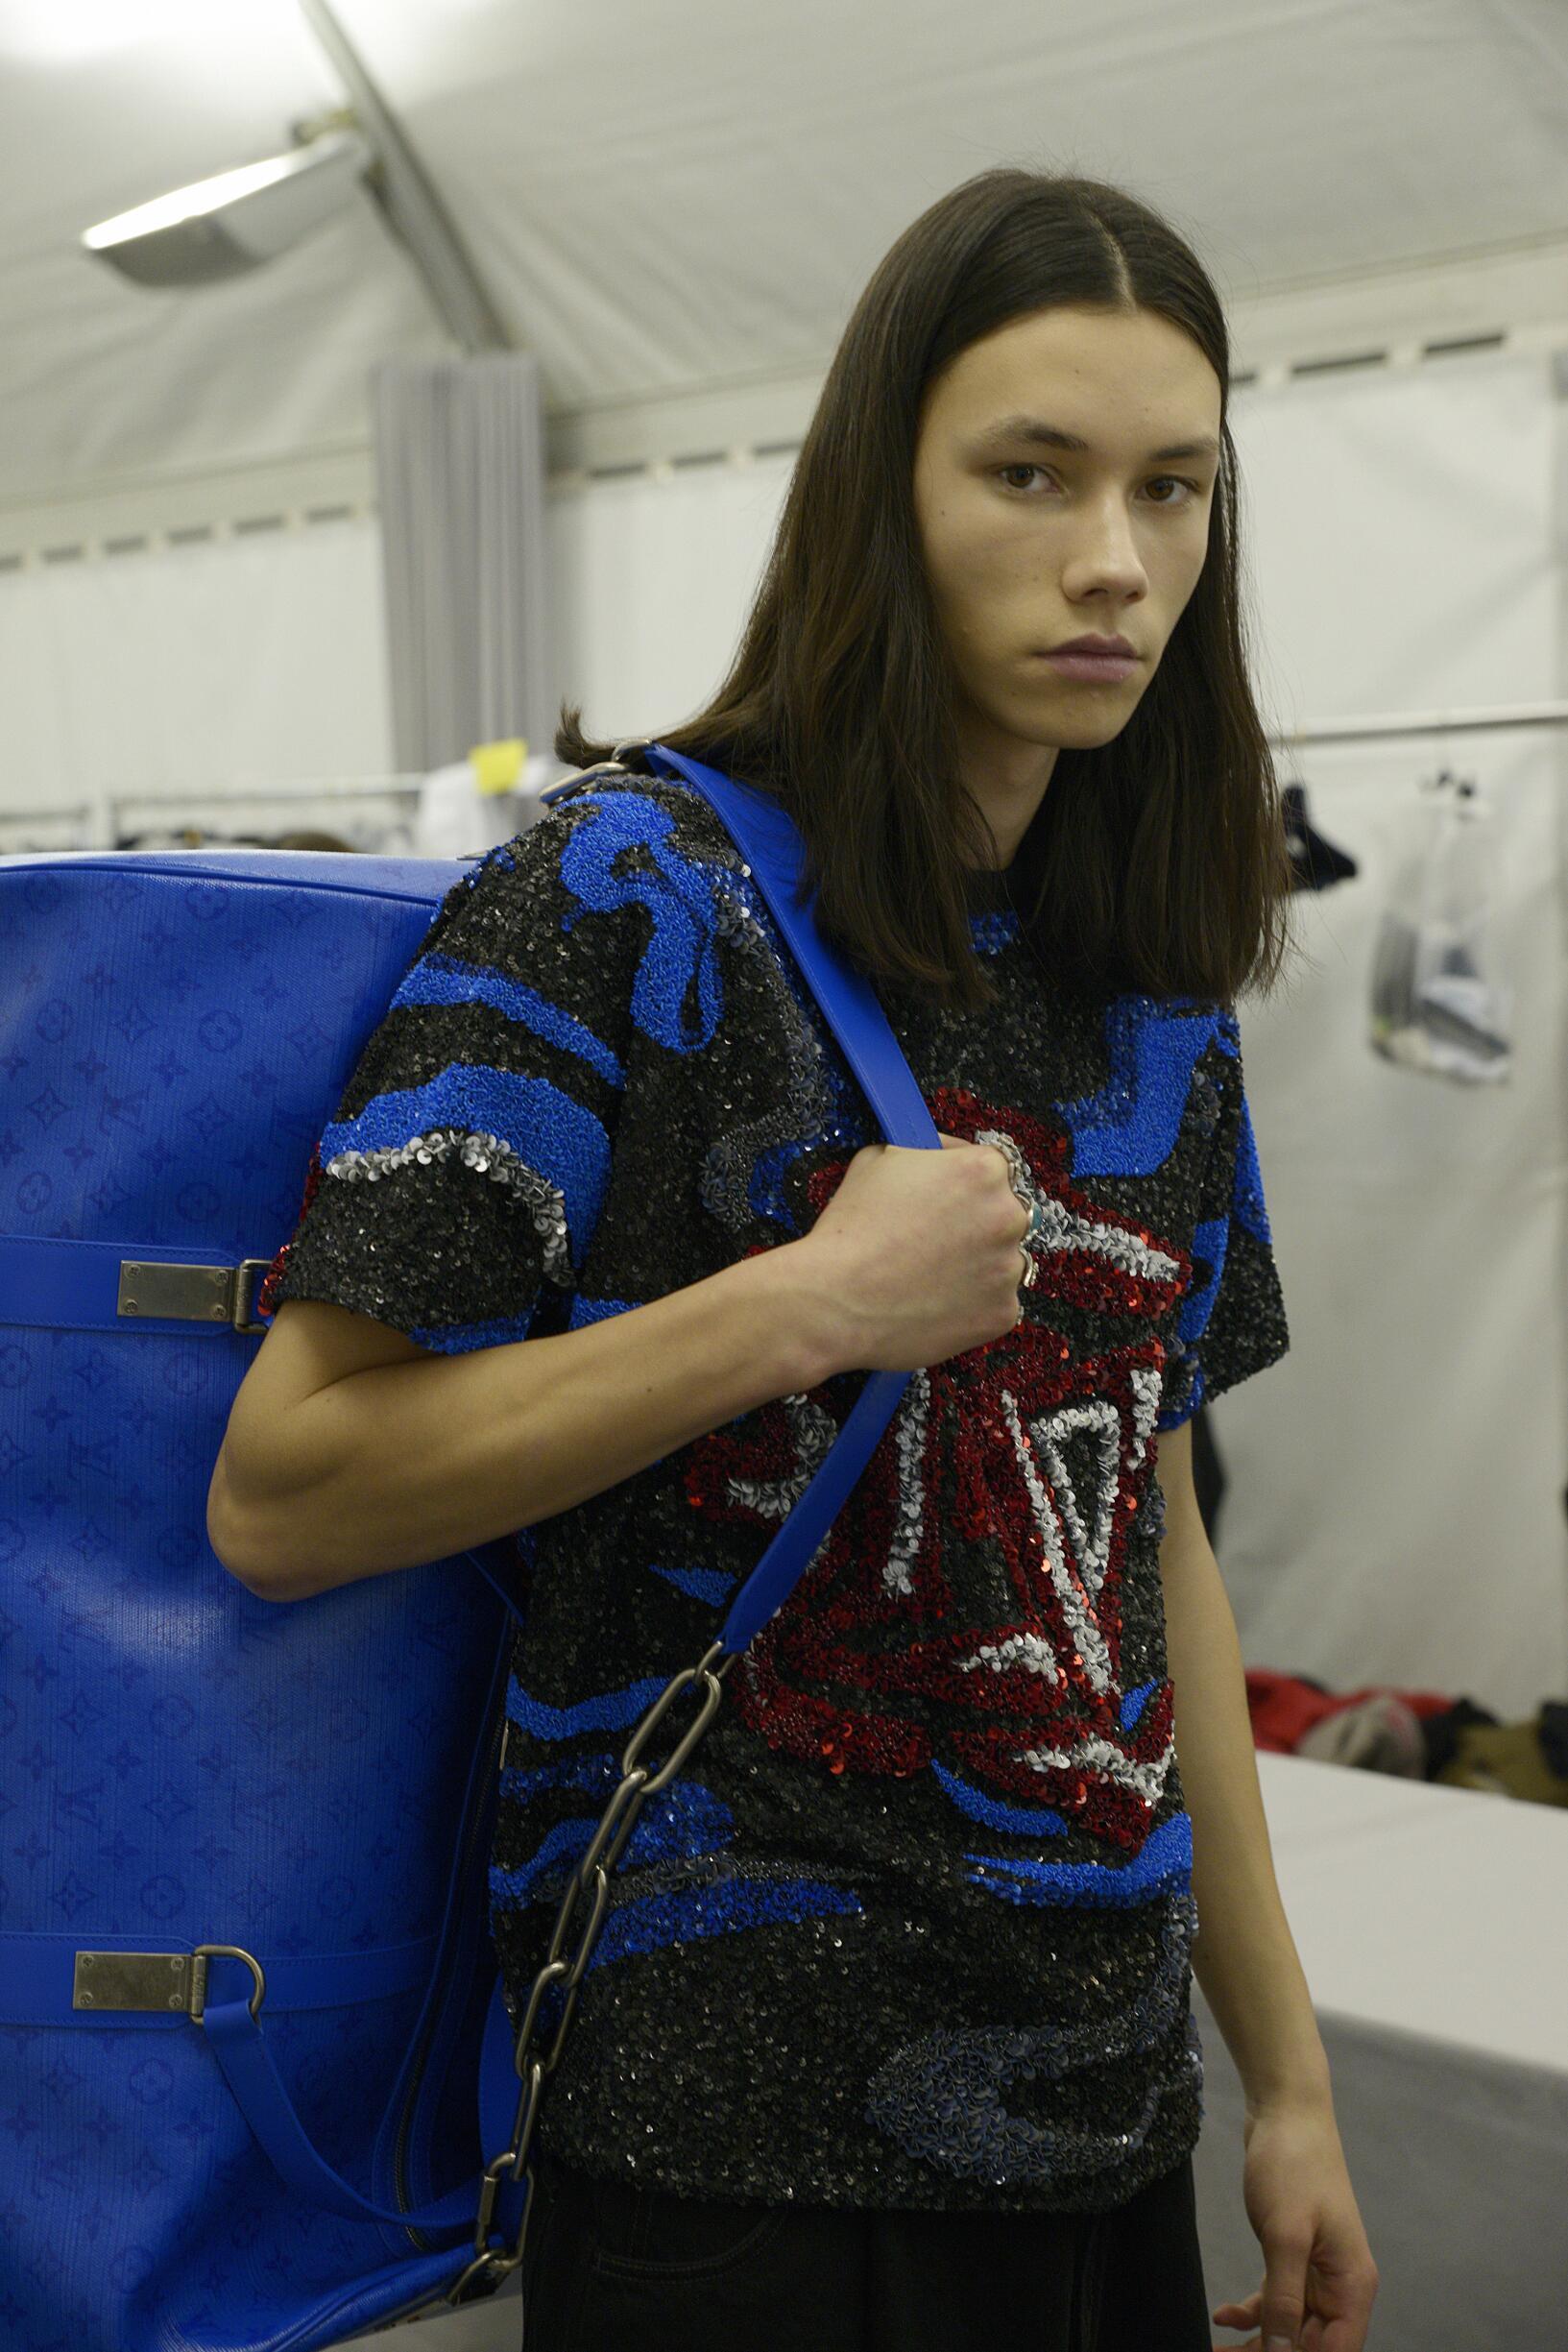 Backstage Louis Vuitton Model 2019 FW